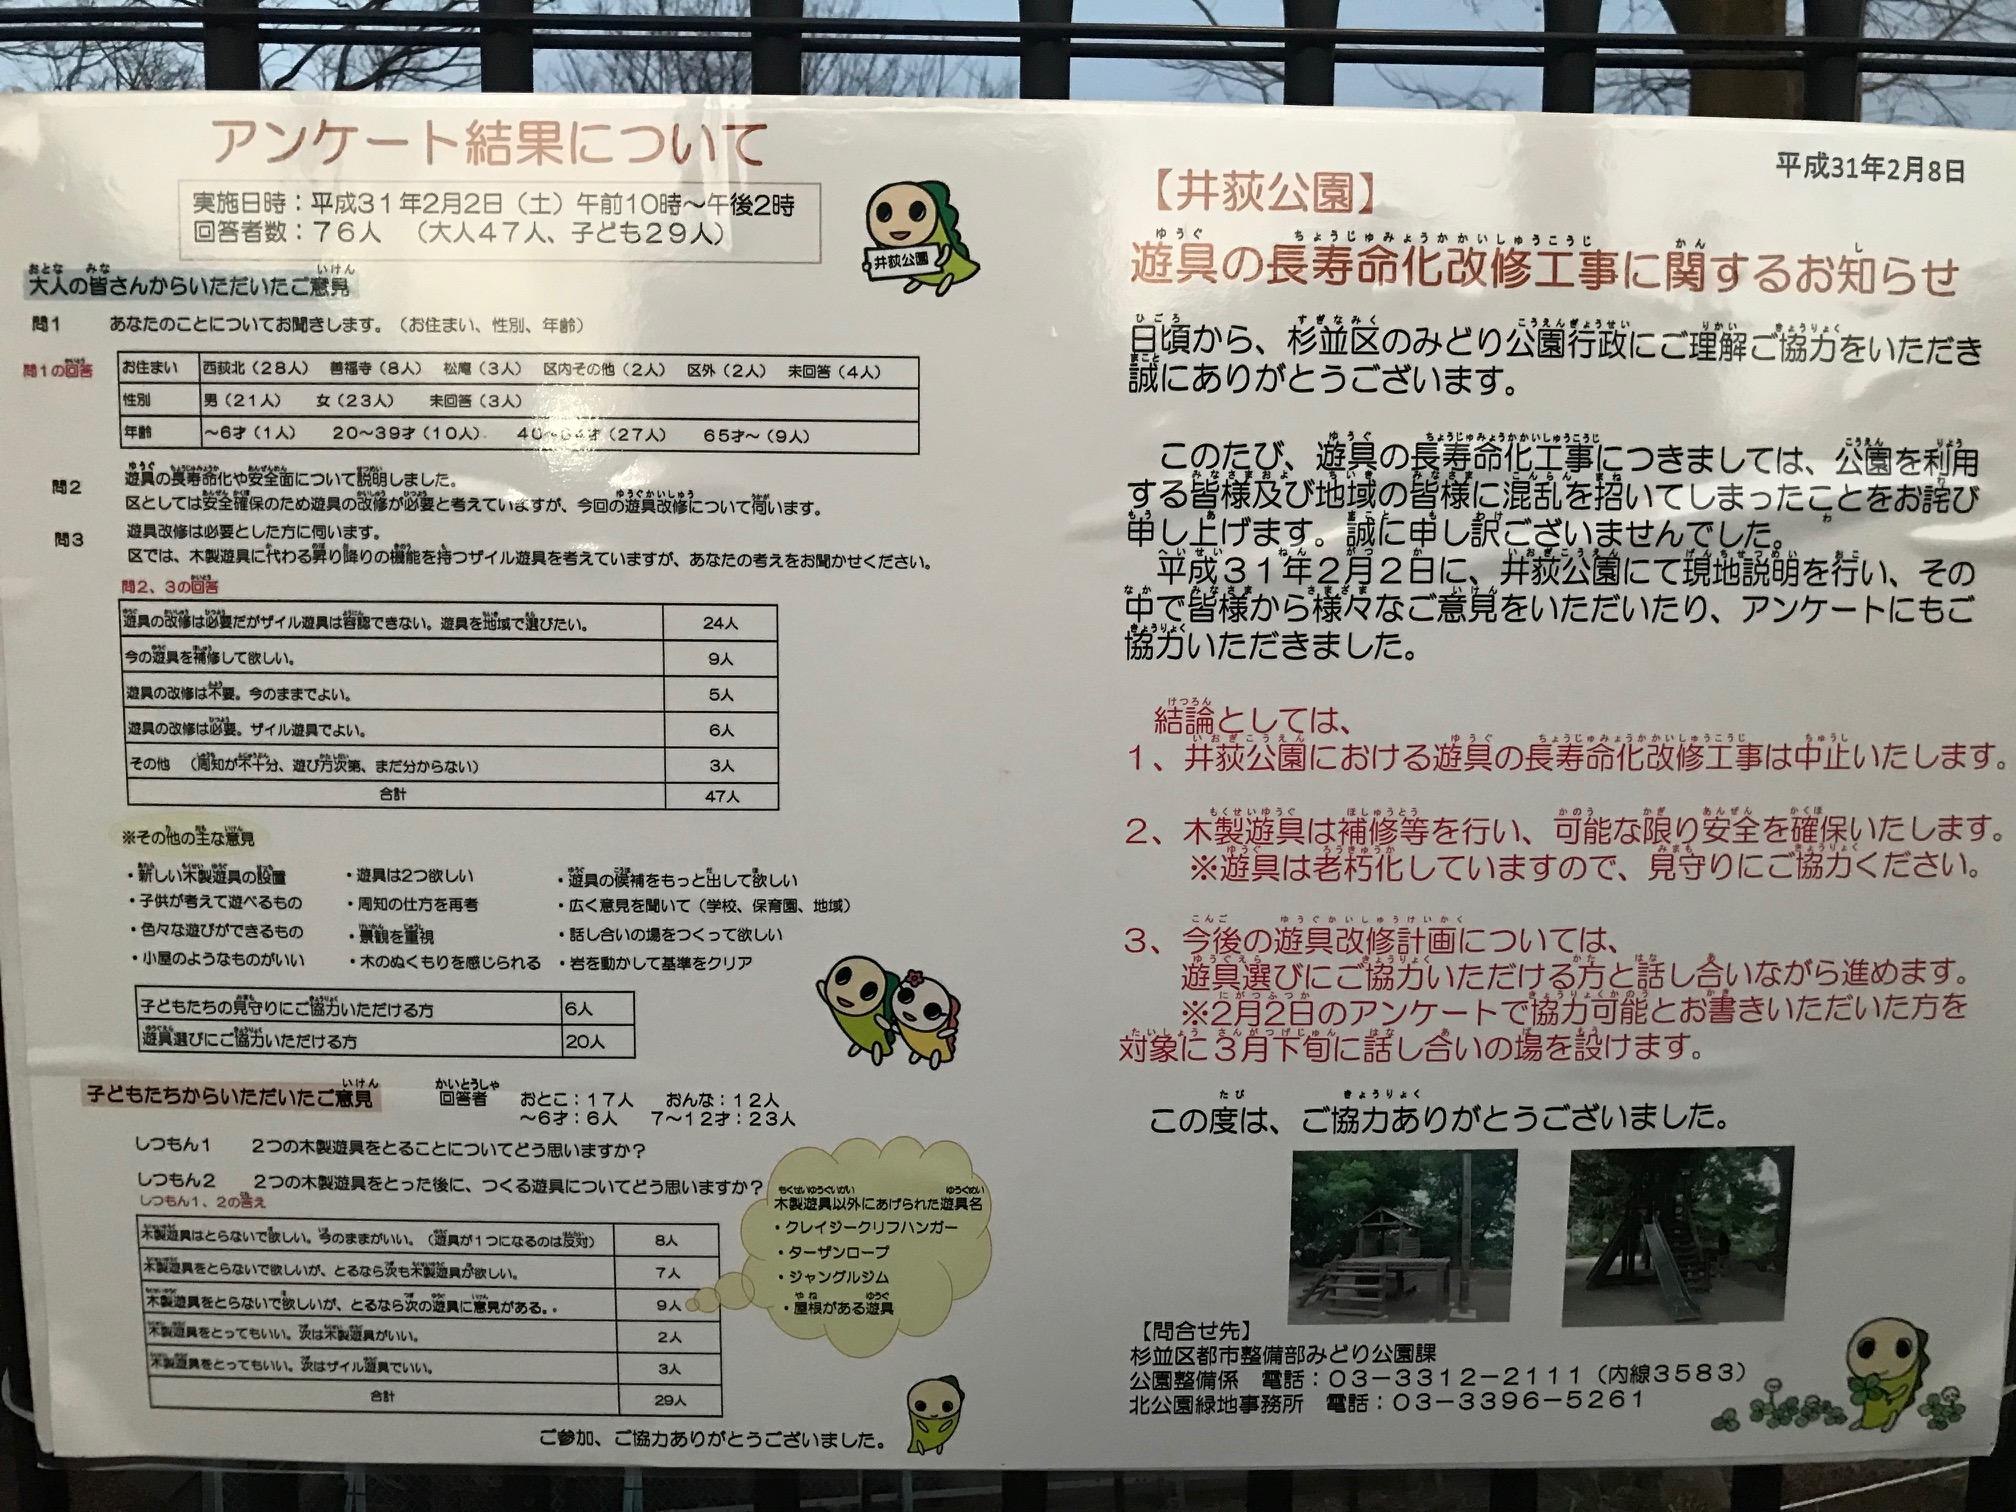 http://yamadakohei.jp/blog_upfile/IMG_3330.jpg